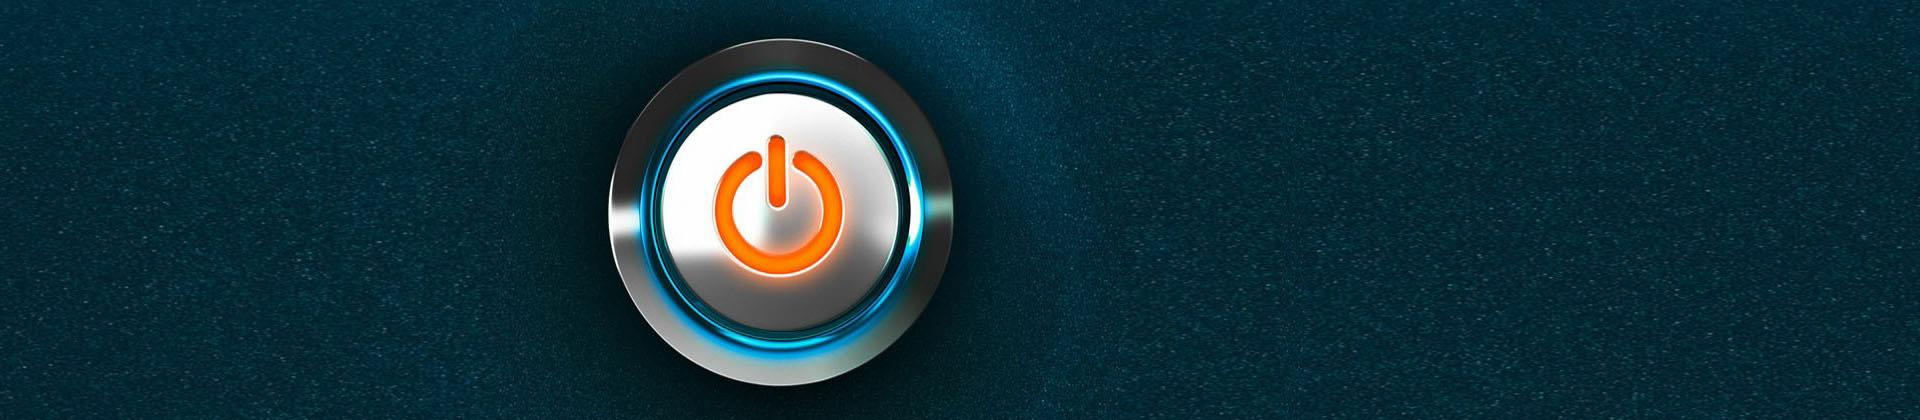 Operim power button banner